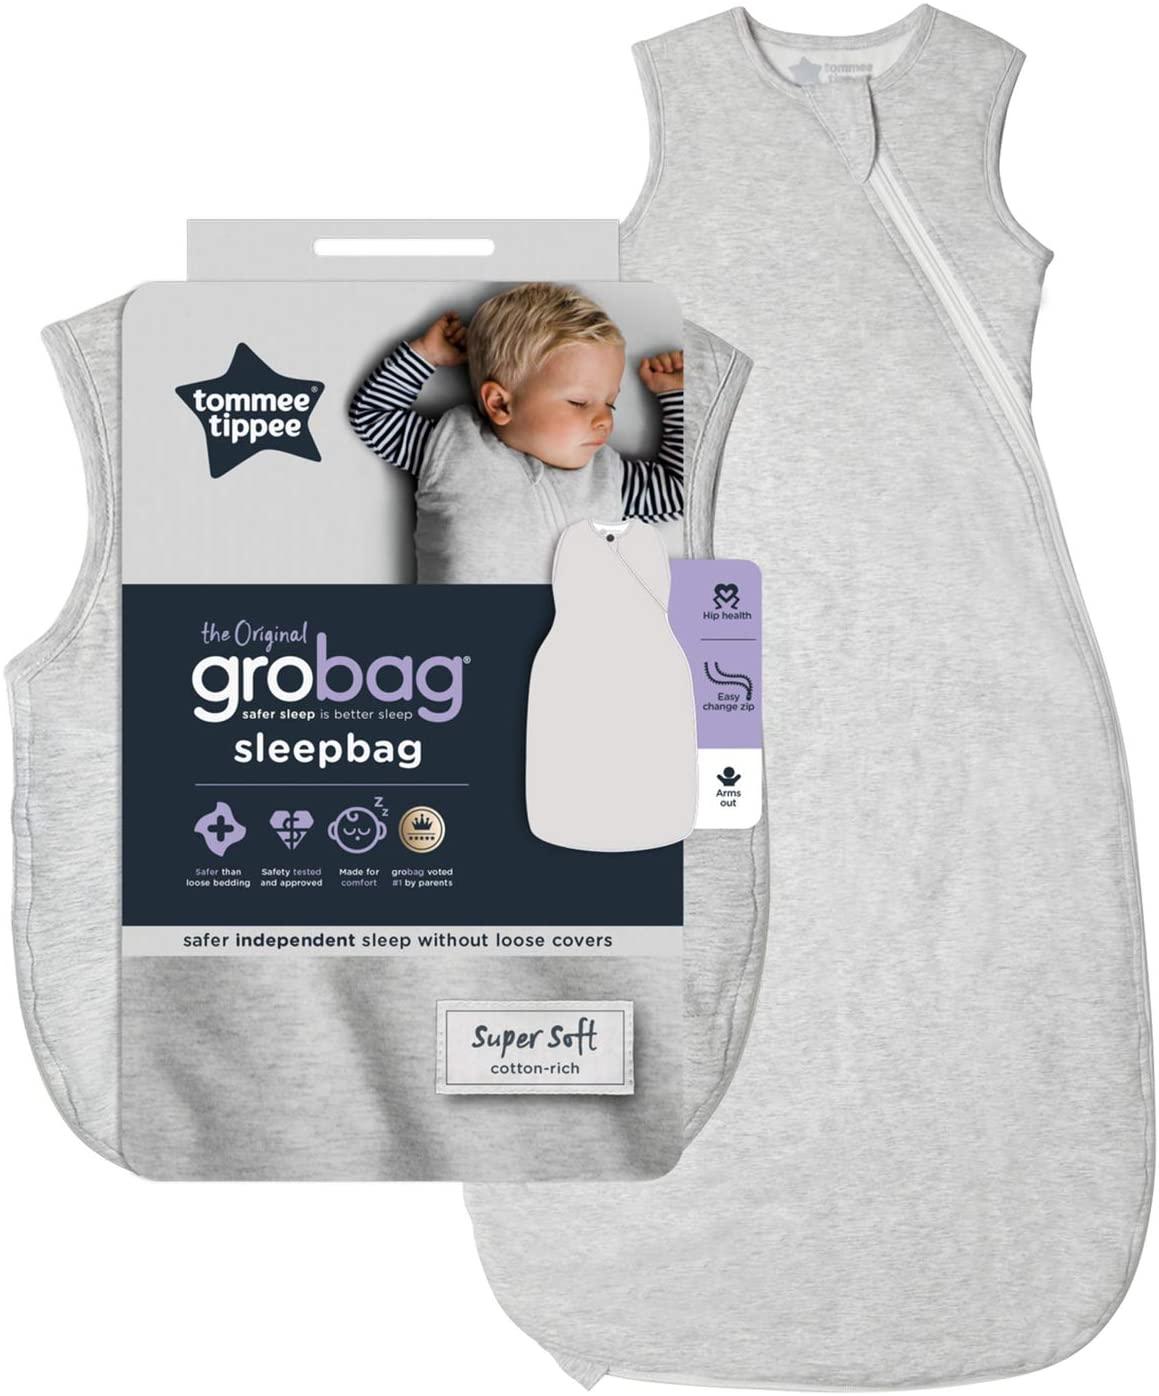 The Original Grobag Grey Marl Sleepbag 0.2 Tog 6-18 Months for £12 Prime (+£4.49 non Prime) at Amazon